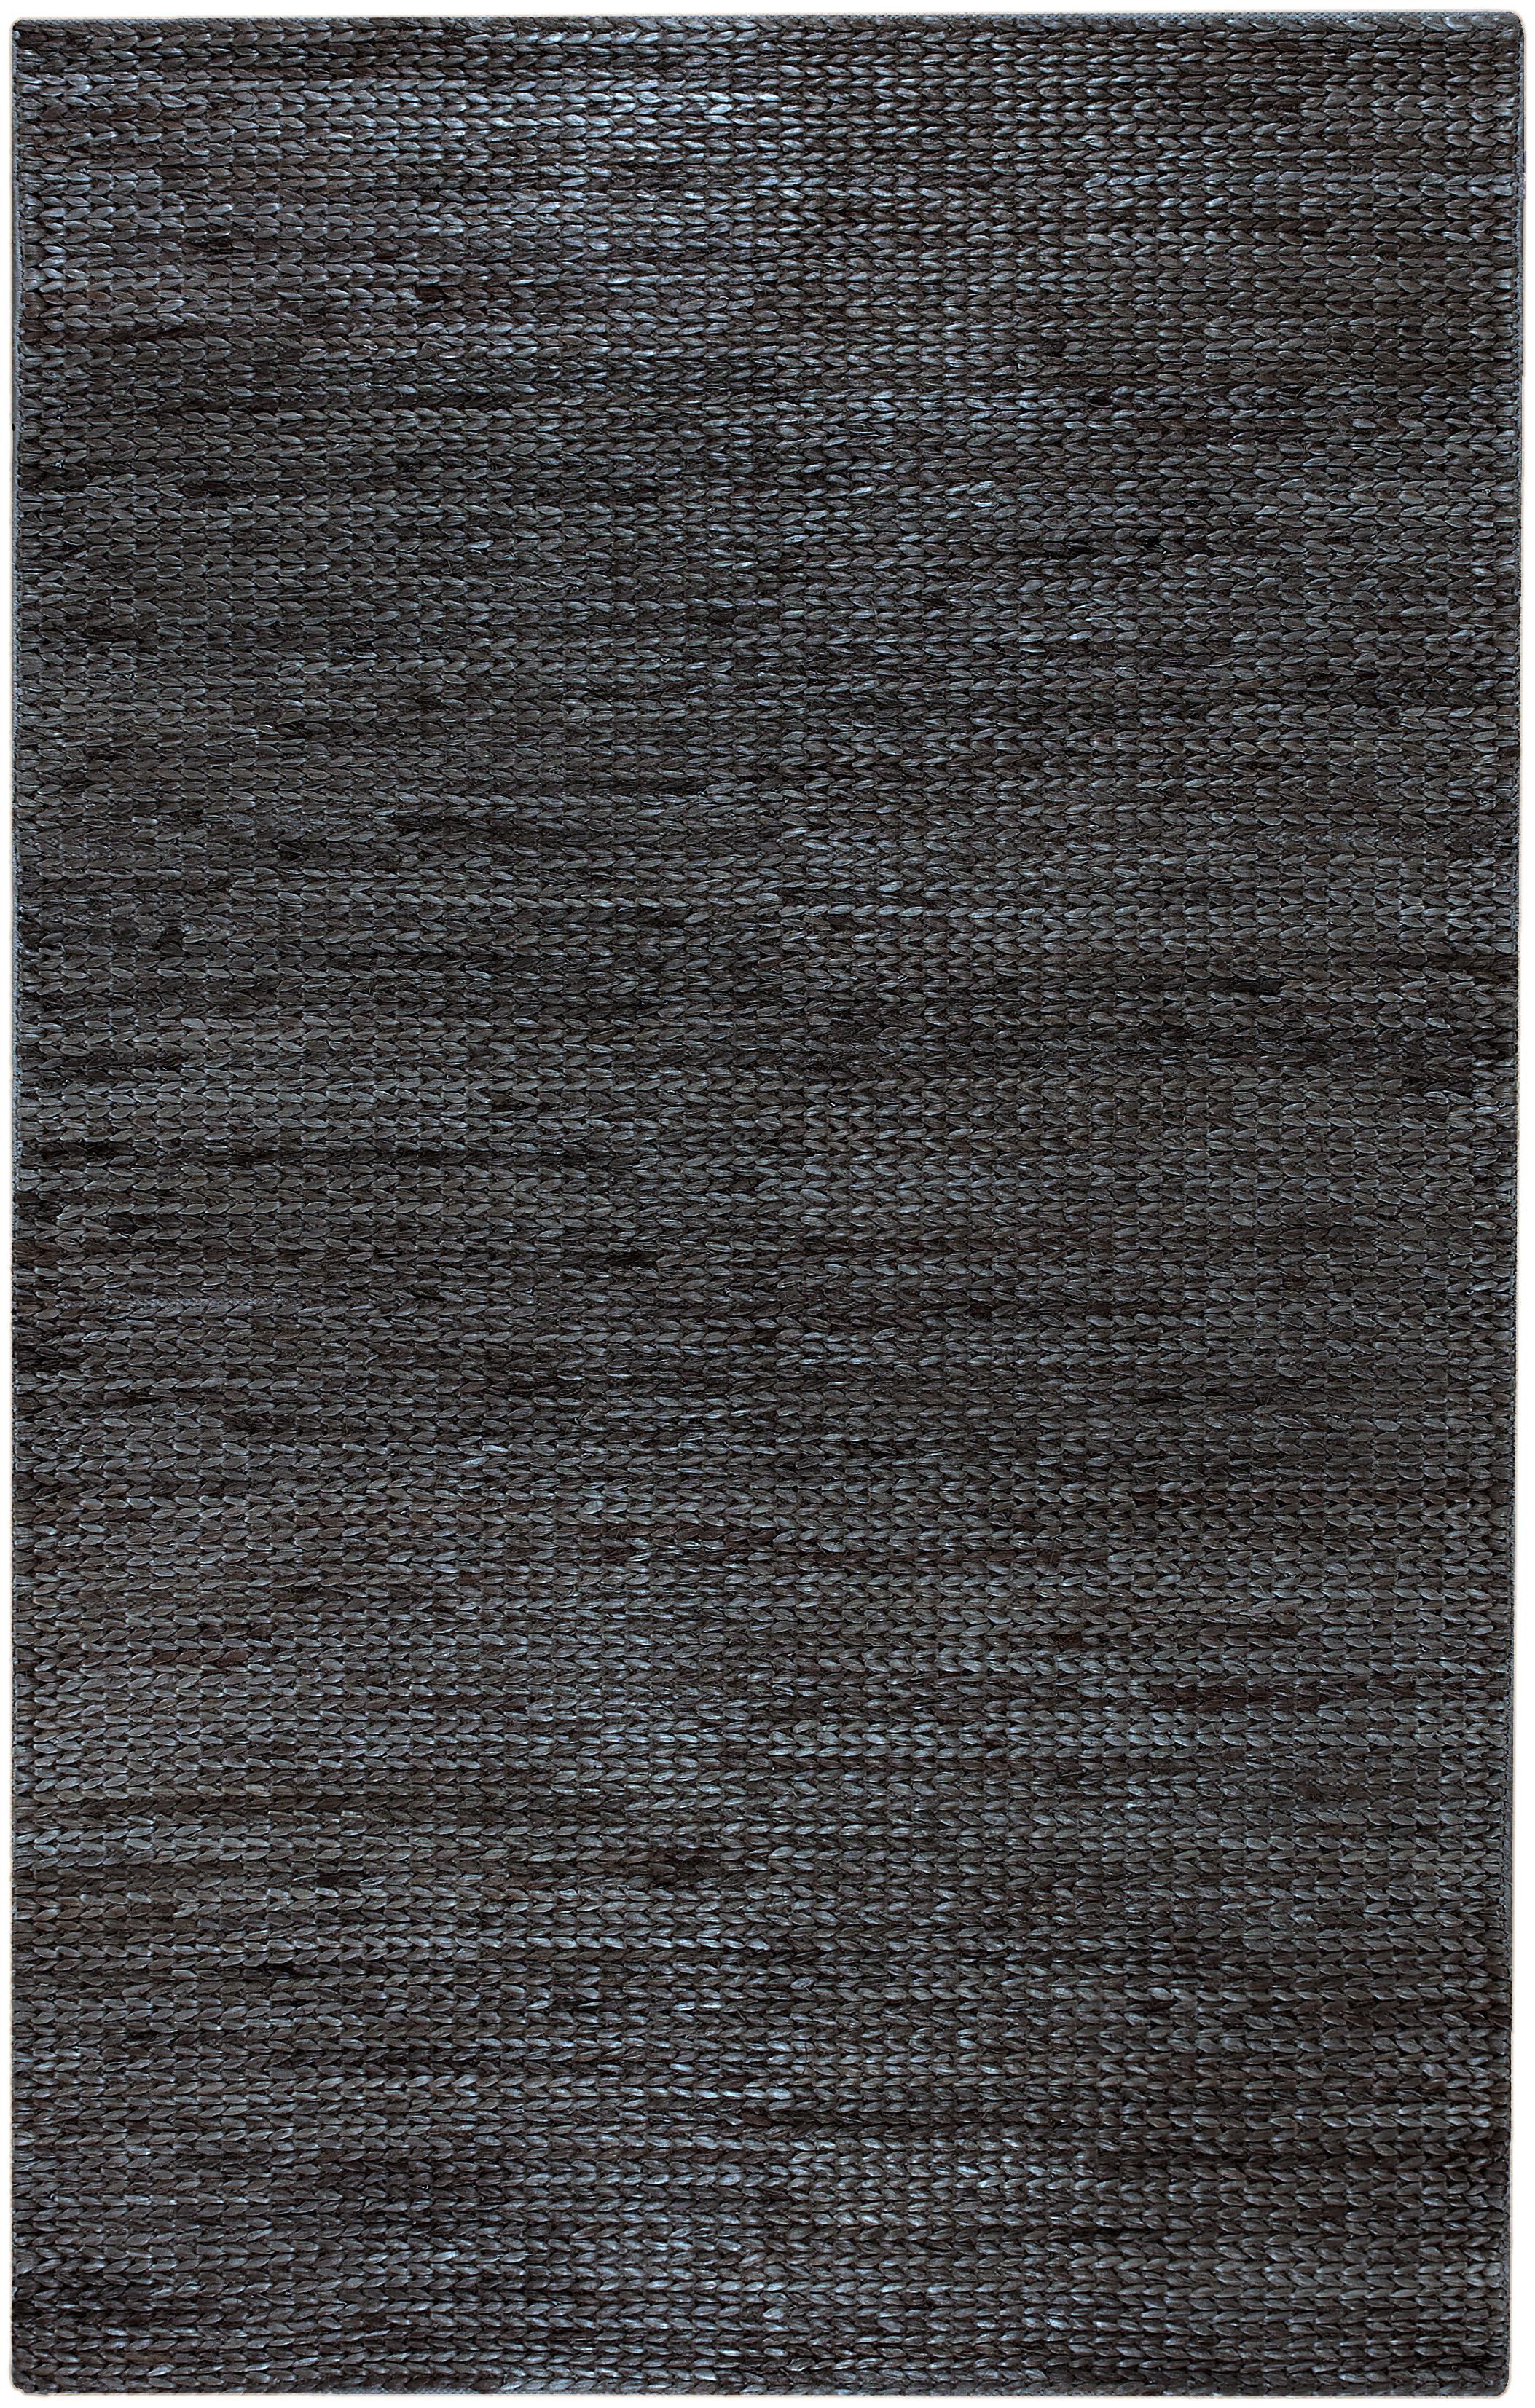 Surya Rugs Tropics 8' x 11' - Item Number: TRO1024-811